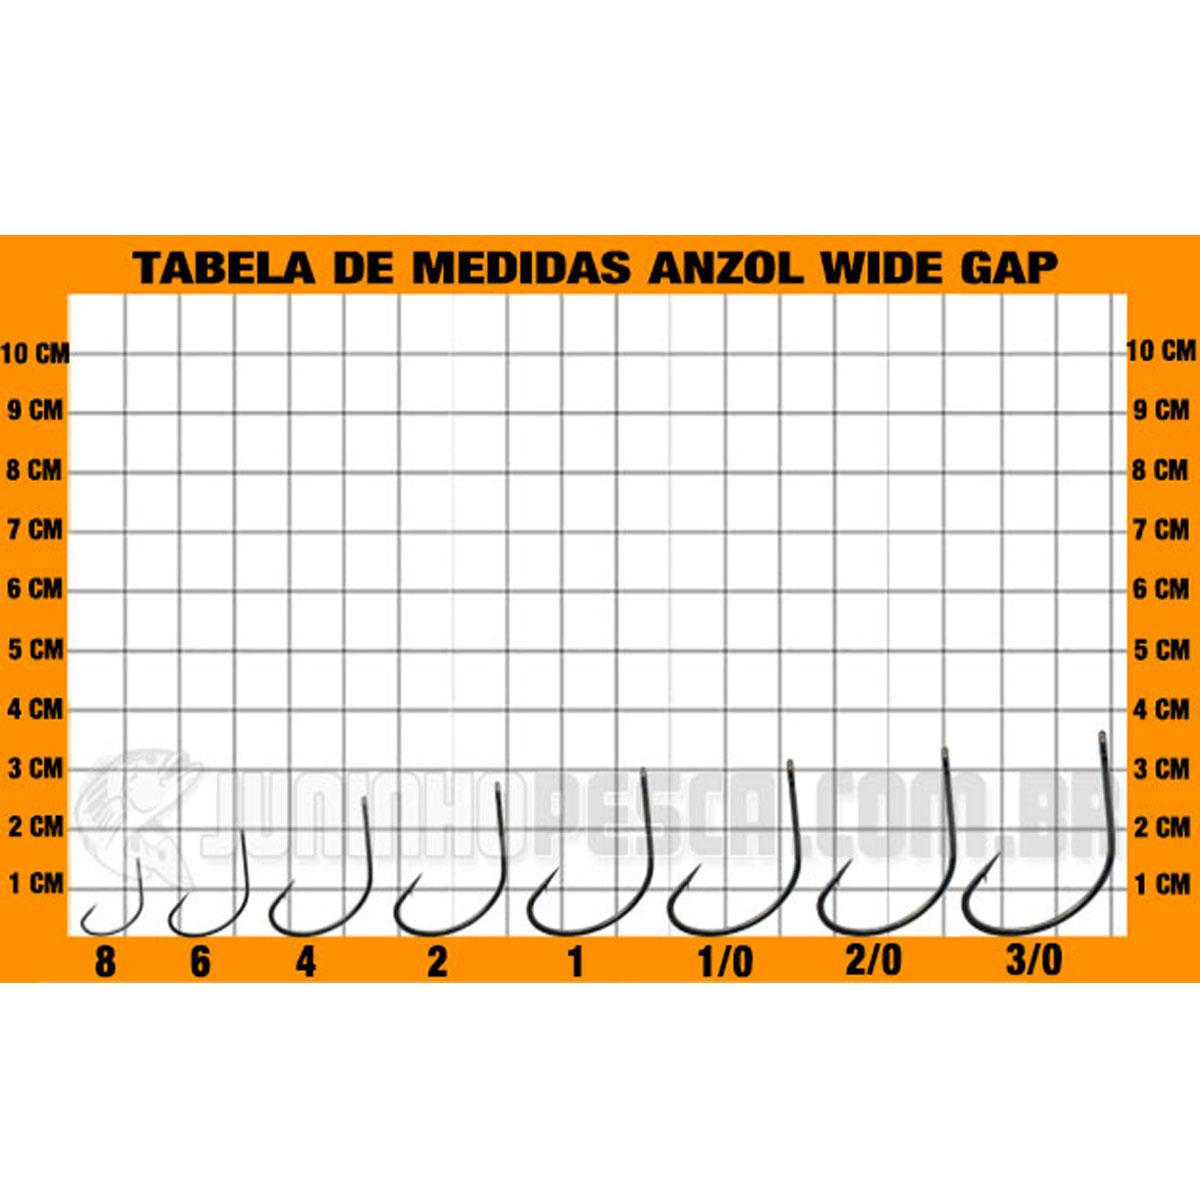 Anzol Pinnacle Wide Gap nº 3/0  - Pró Pesca Shop